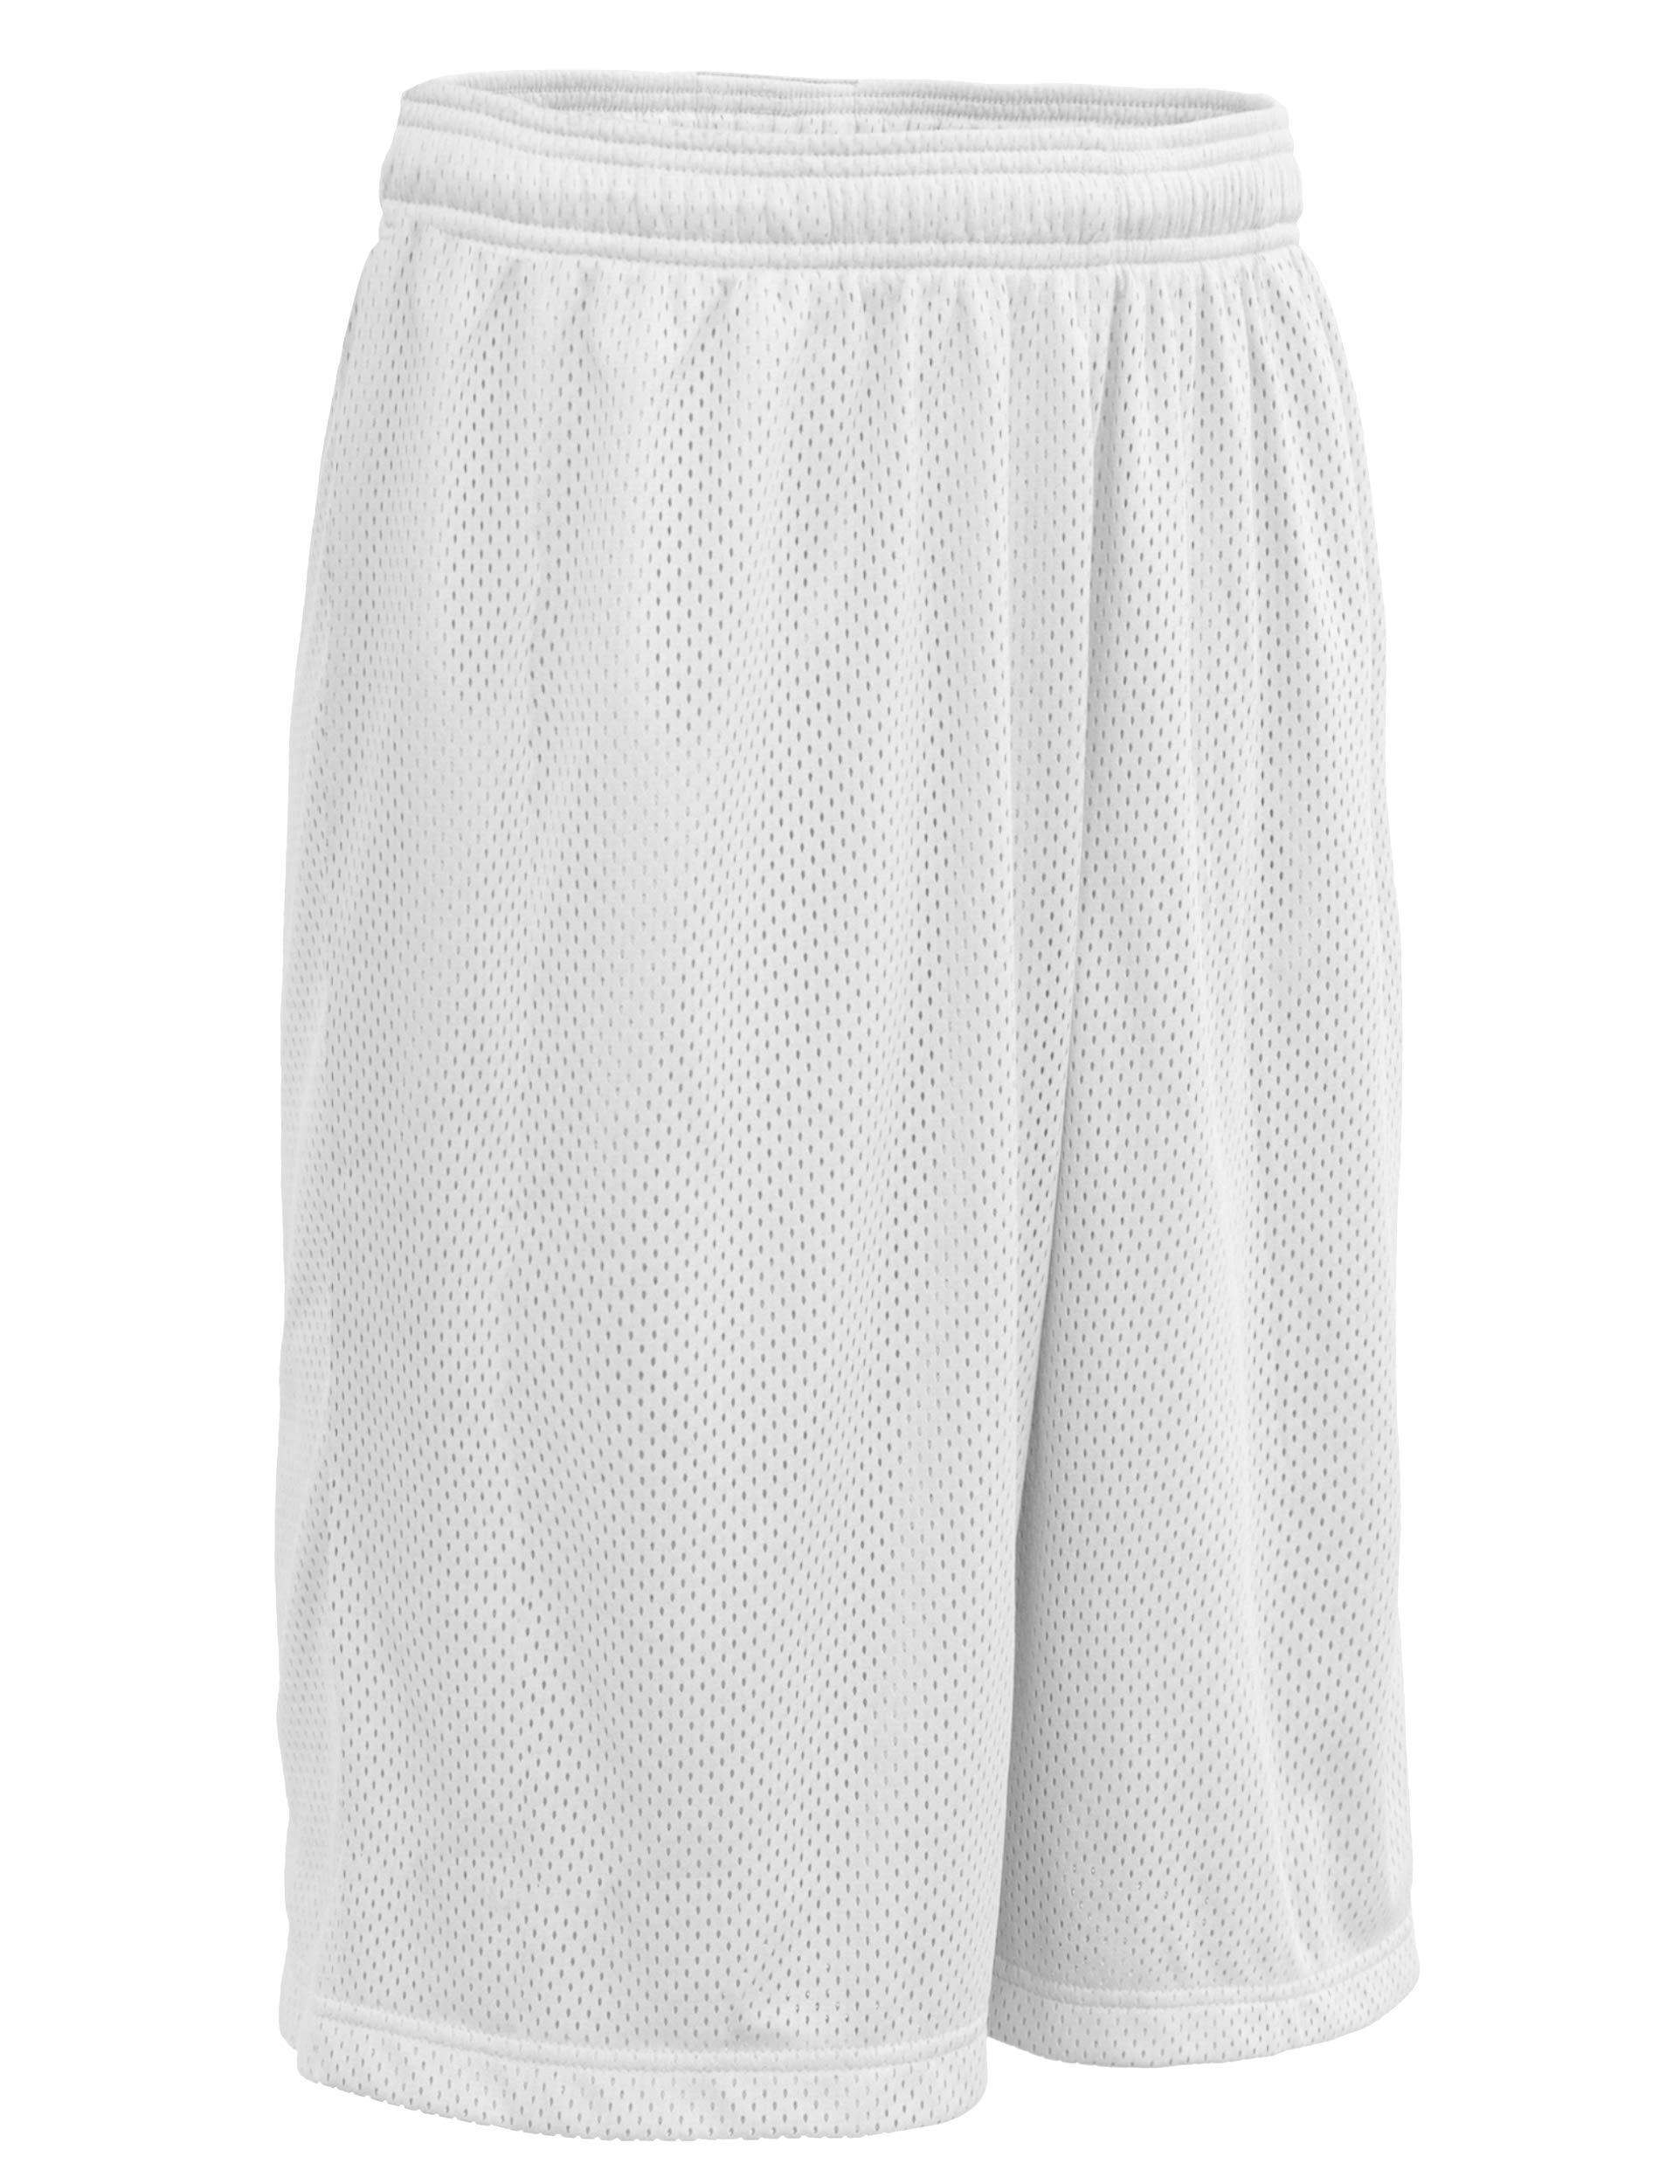 ViiViiKay Men's Athletic Basketball Shorts - Mesh Workout Gym Shorts with Pocket MESH_White M